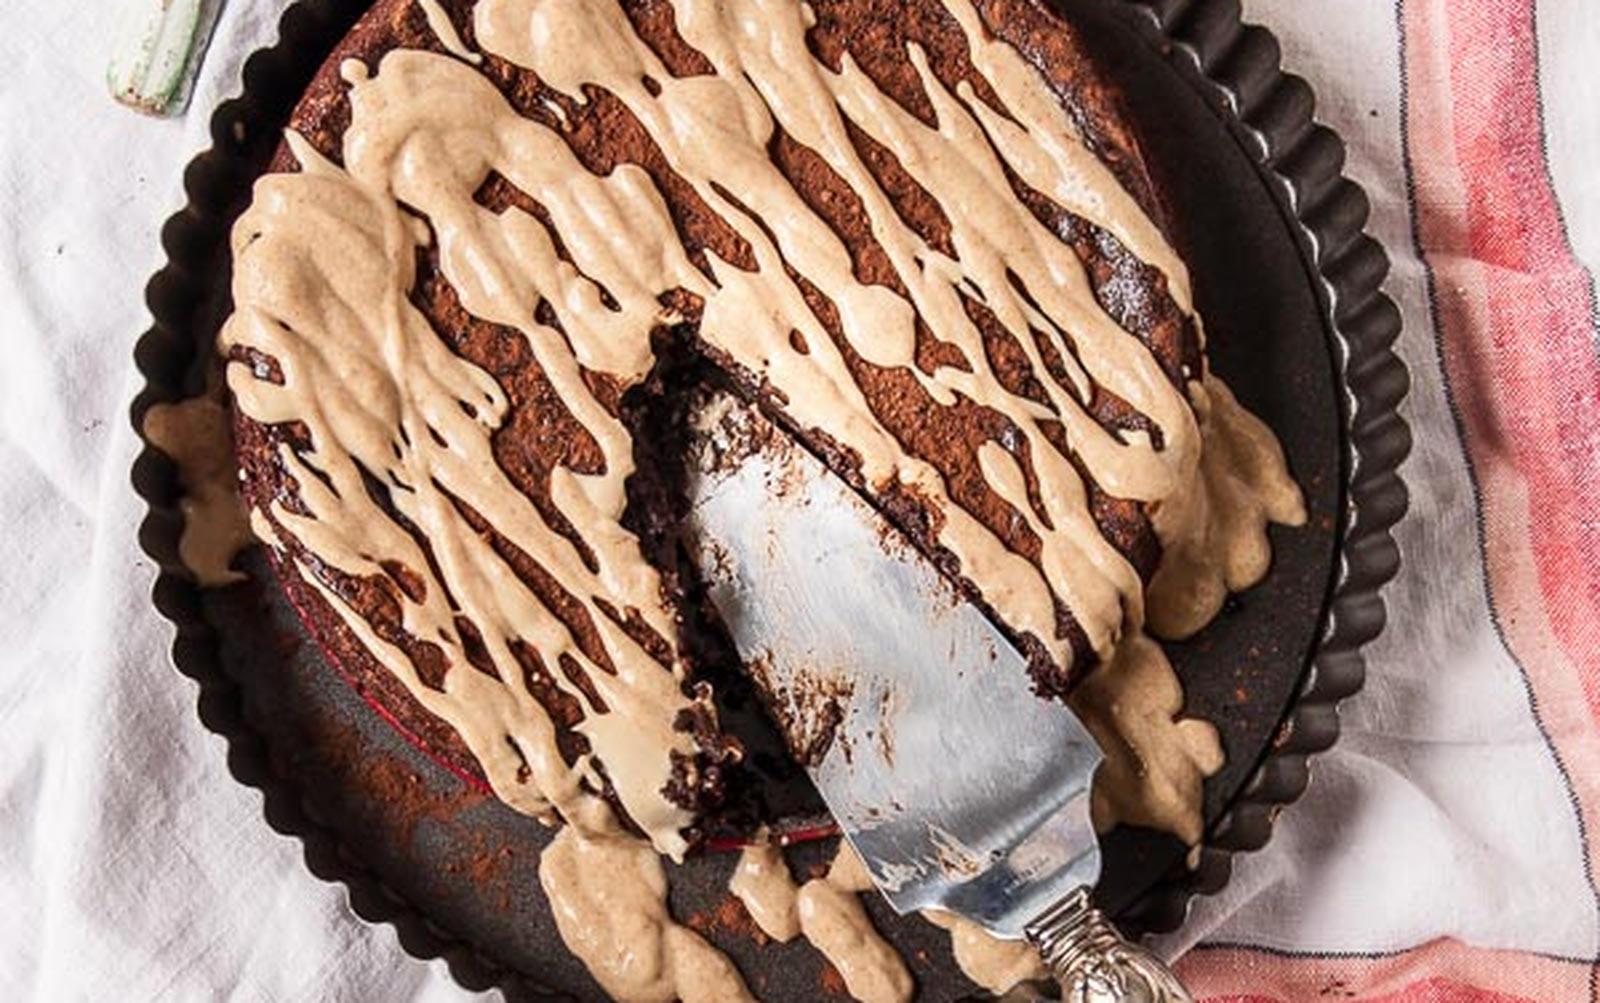 Flourless Peanut Butter and Chocolate Cake